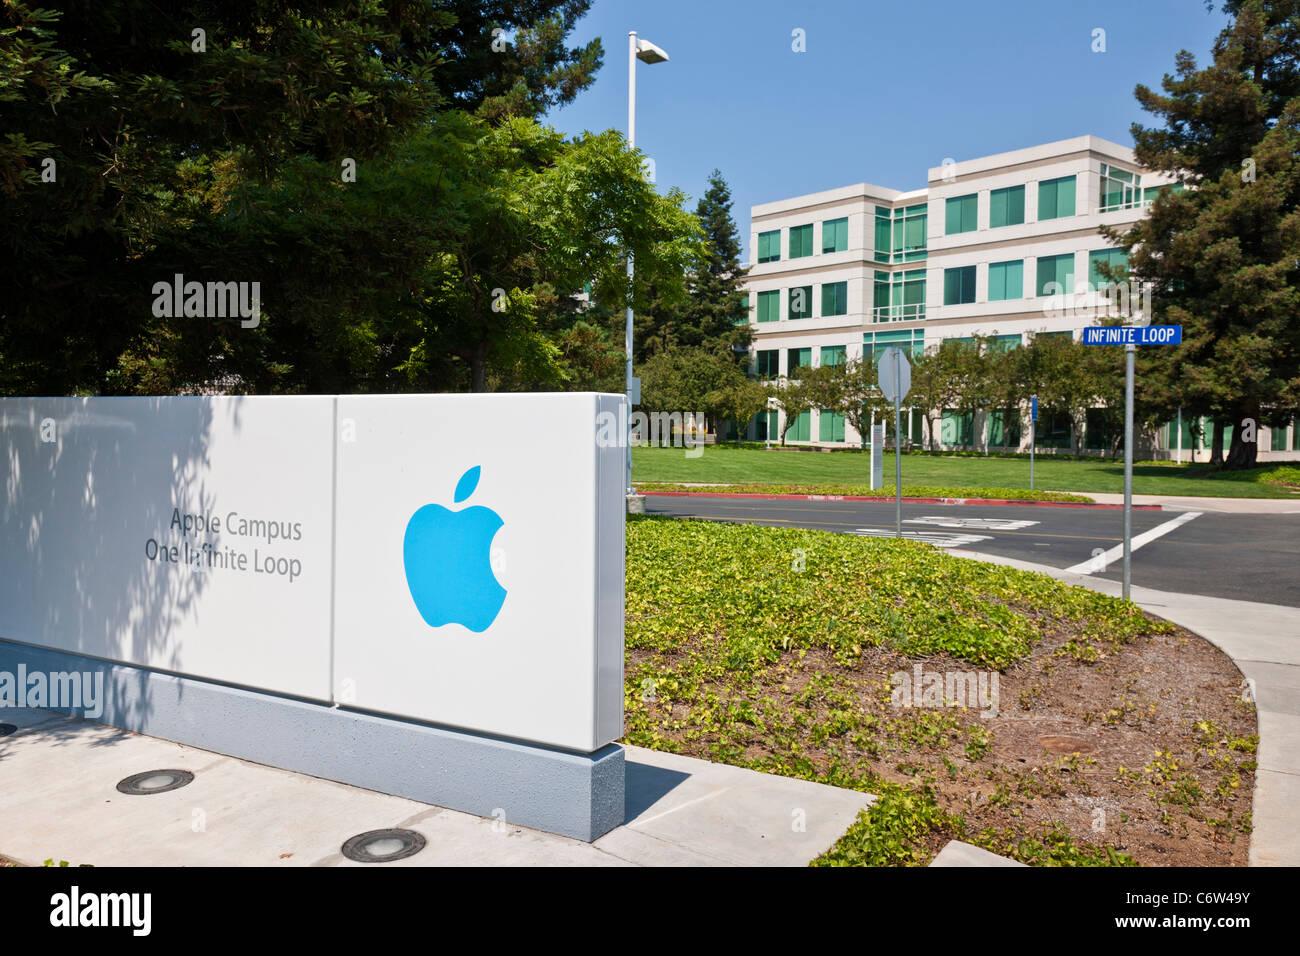 Apple-Logo außerhalb Apple Incorporated Unternehmenszentrale am 1-6 Infinite Loop, Cupertino, Kalifornien, USA. JMH5191 Stockfoto